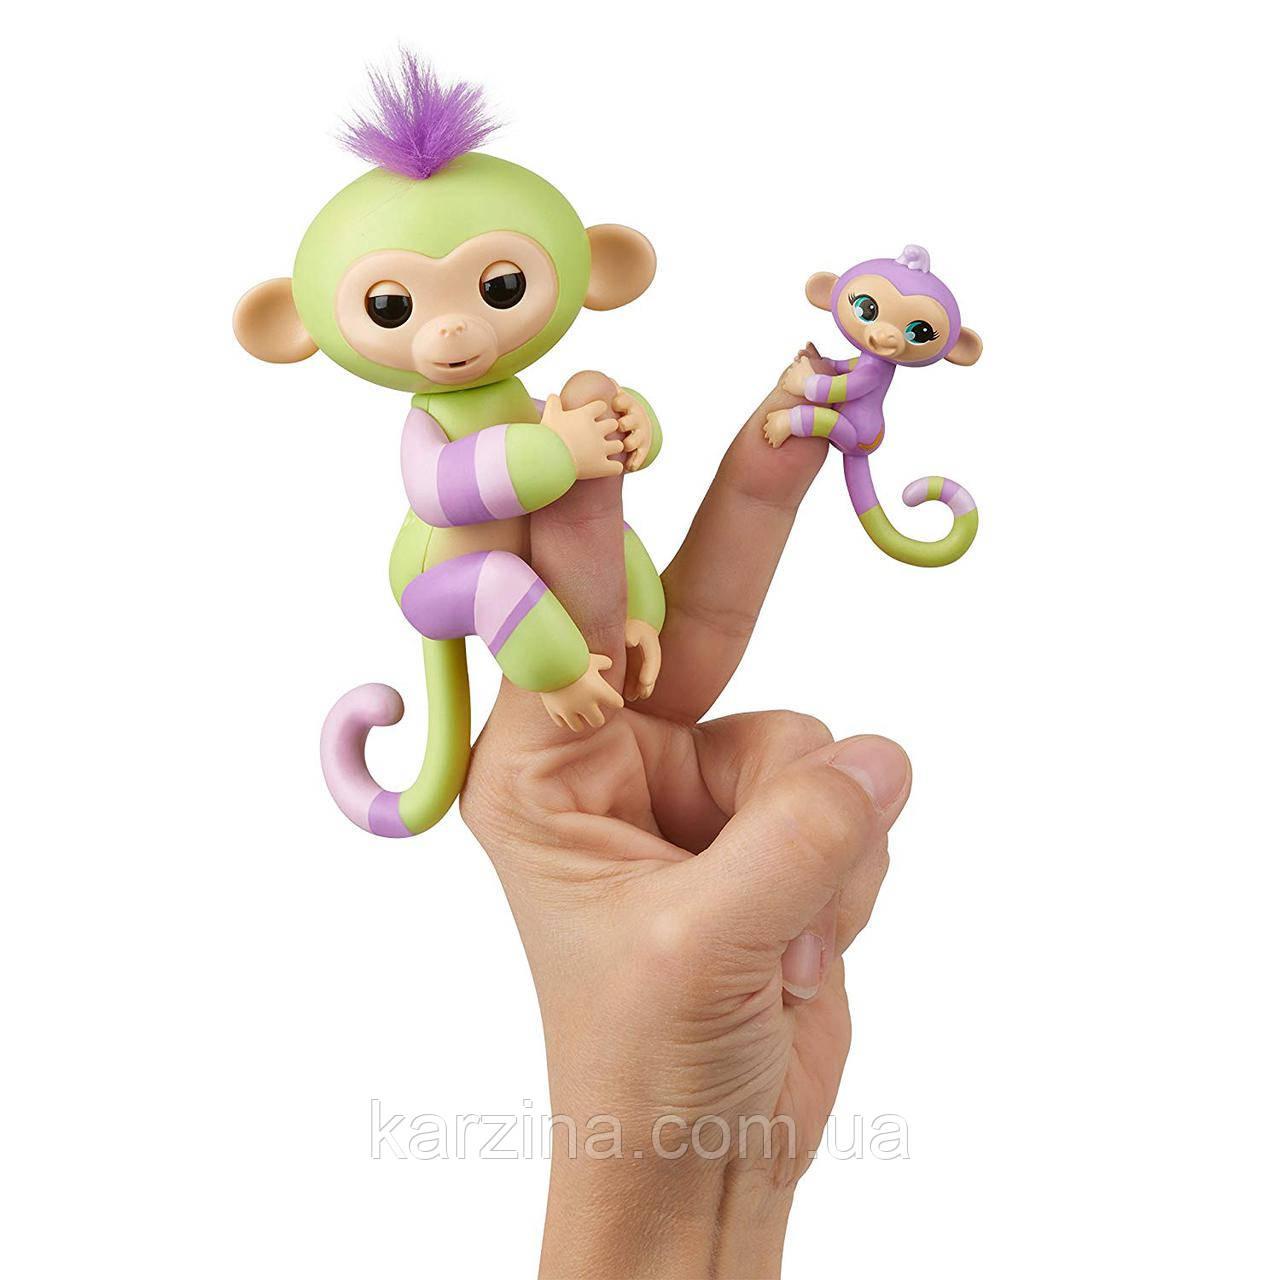 Обезьянки Fingerlings с другом 100% Оригинал WowWee Baby Monkey & Mini Bffs Jess and Eden Джес и Эйден